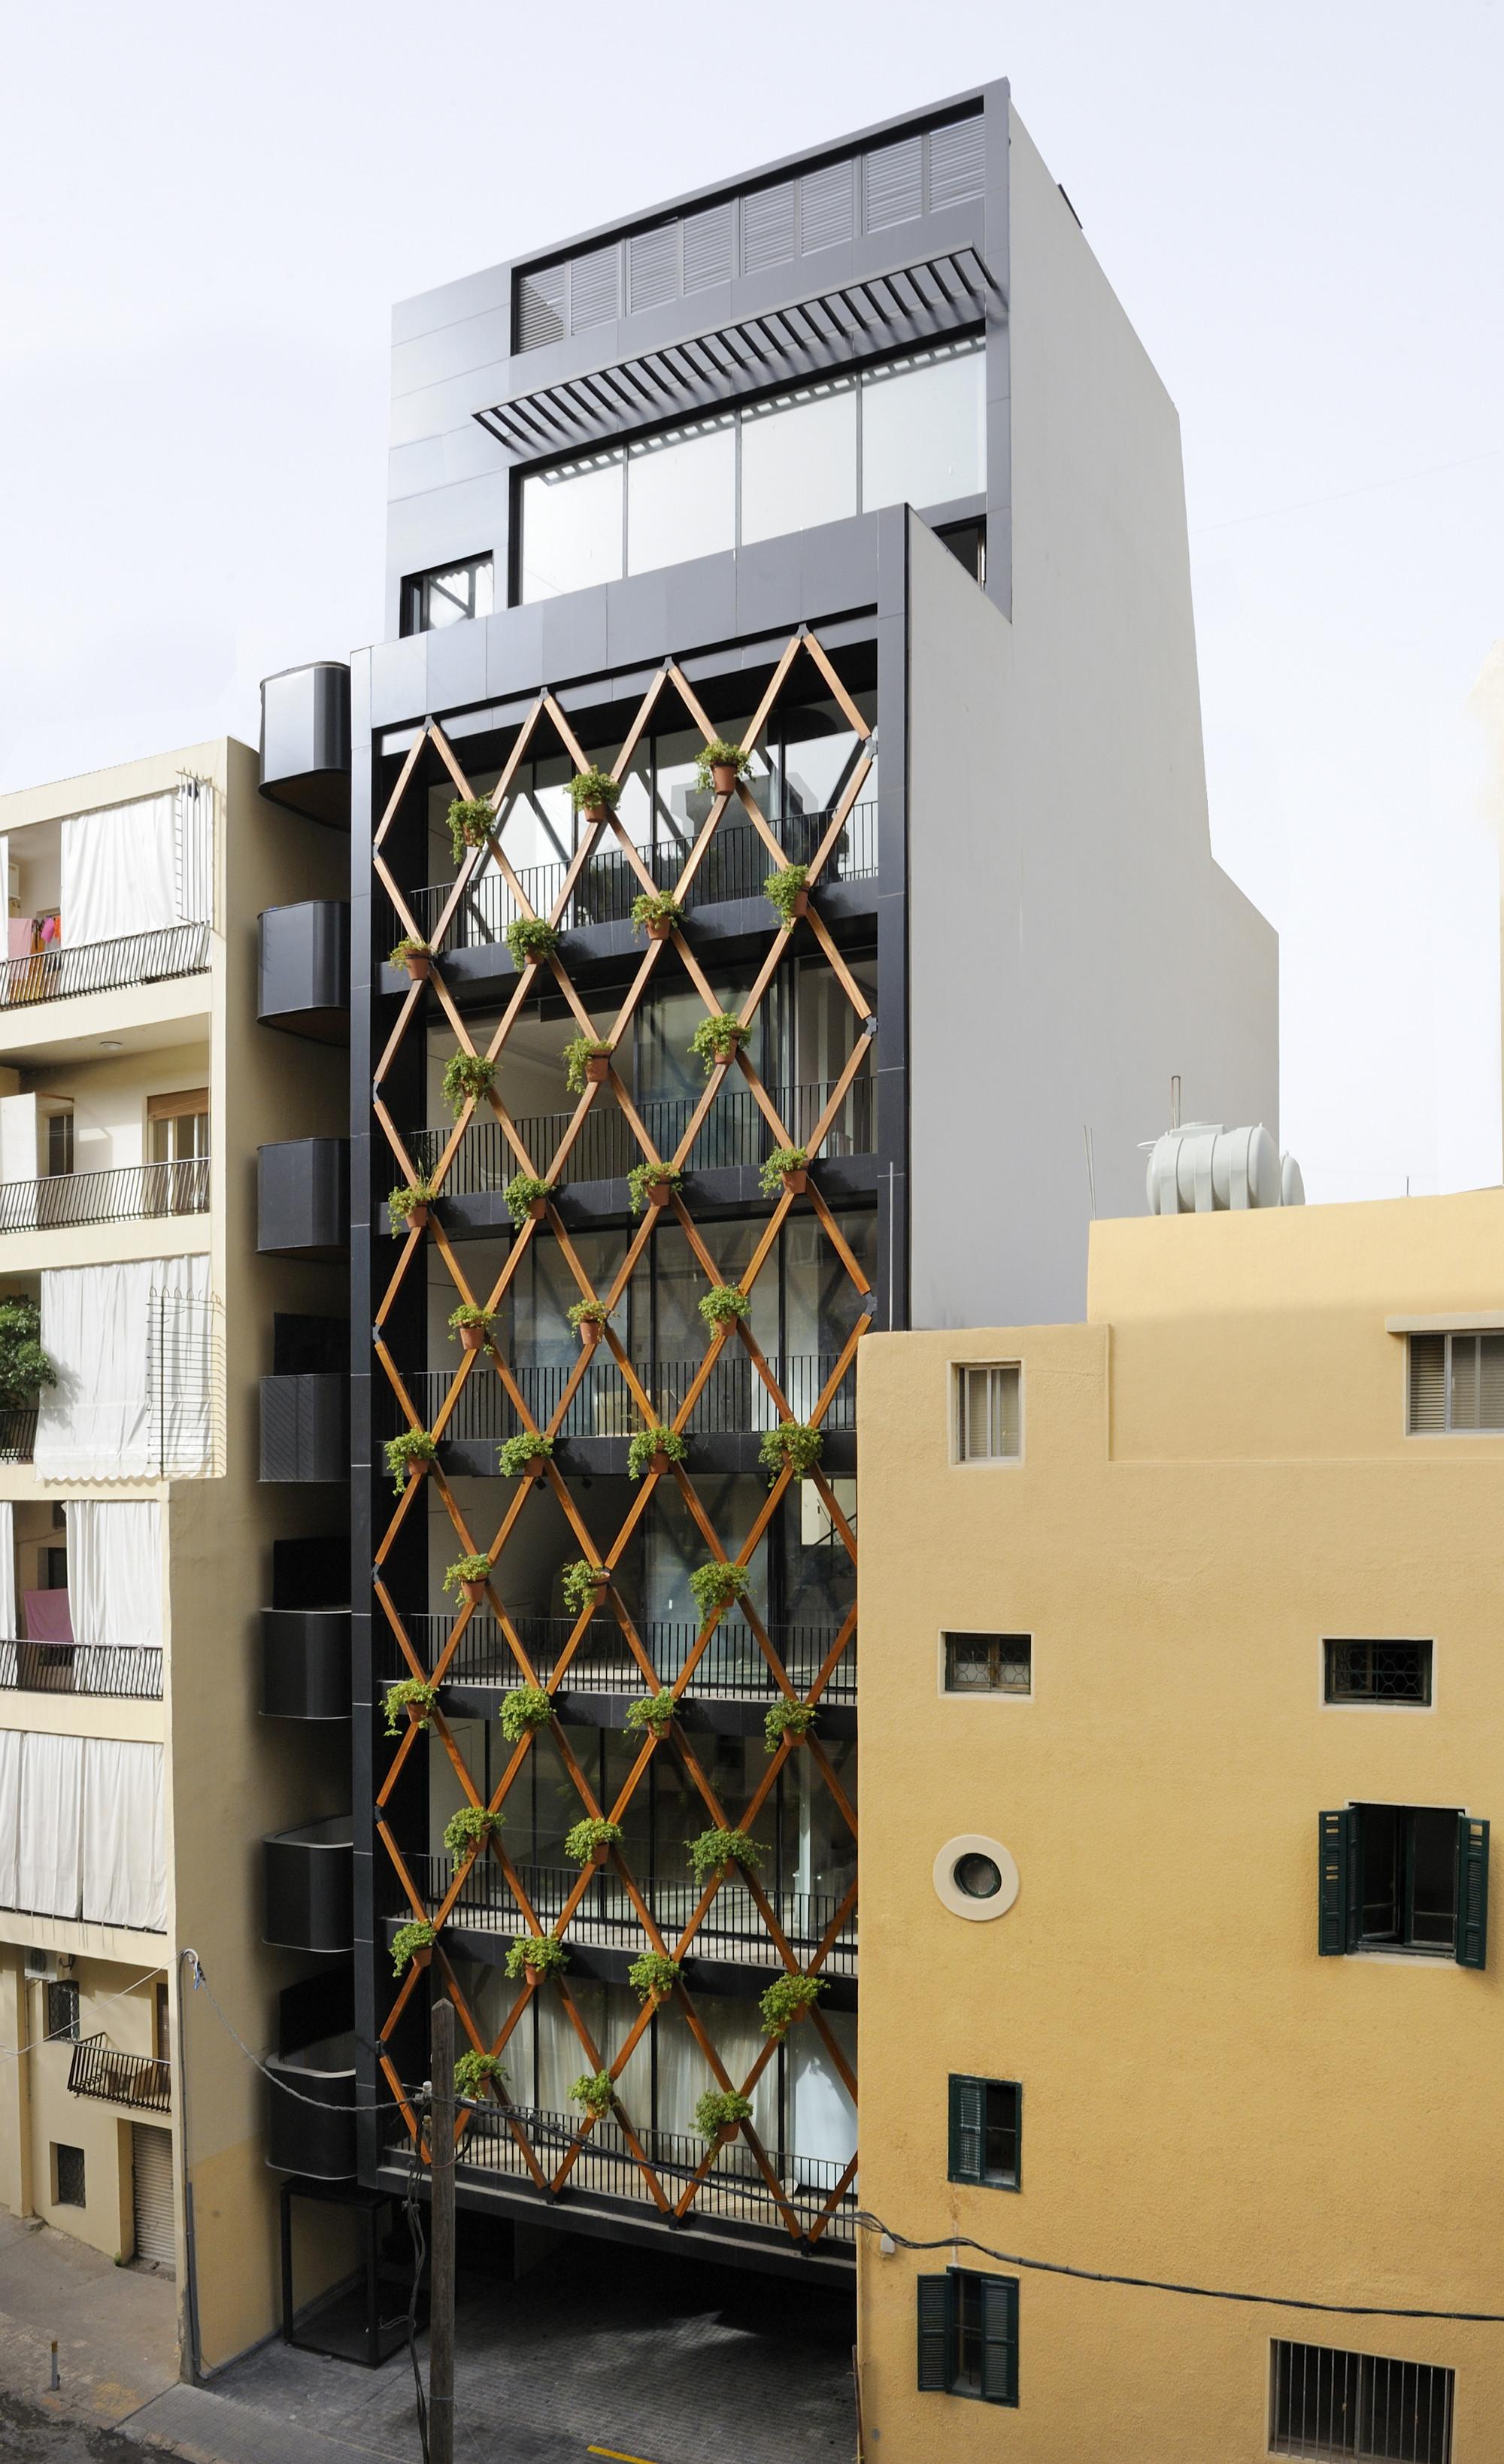 Achrafieh 732 / Bernard Khoury Architects, © Bernard Khoury Architects